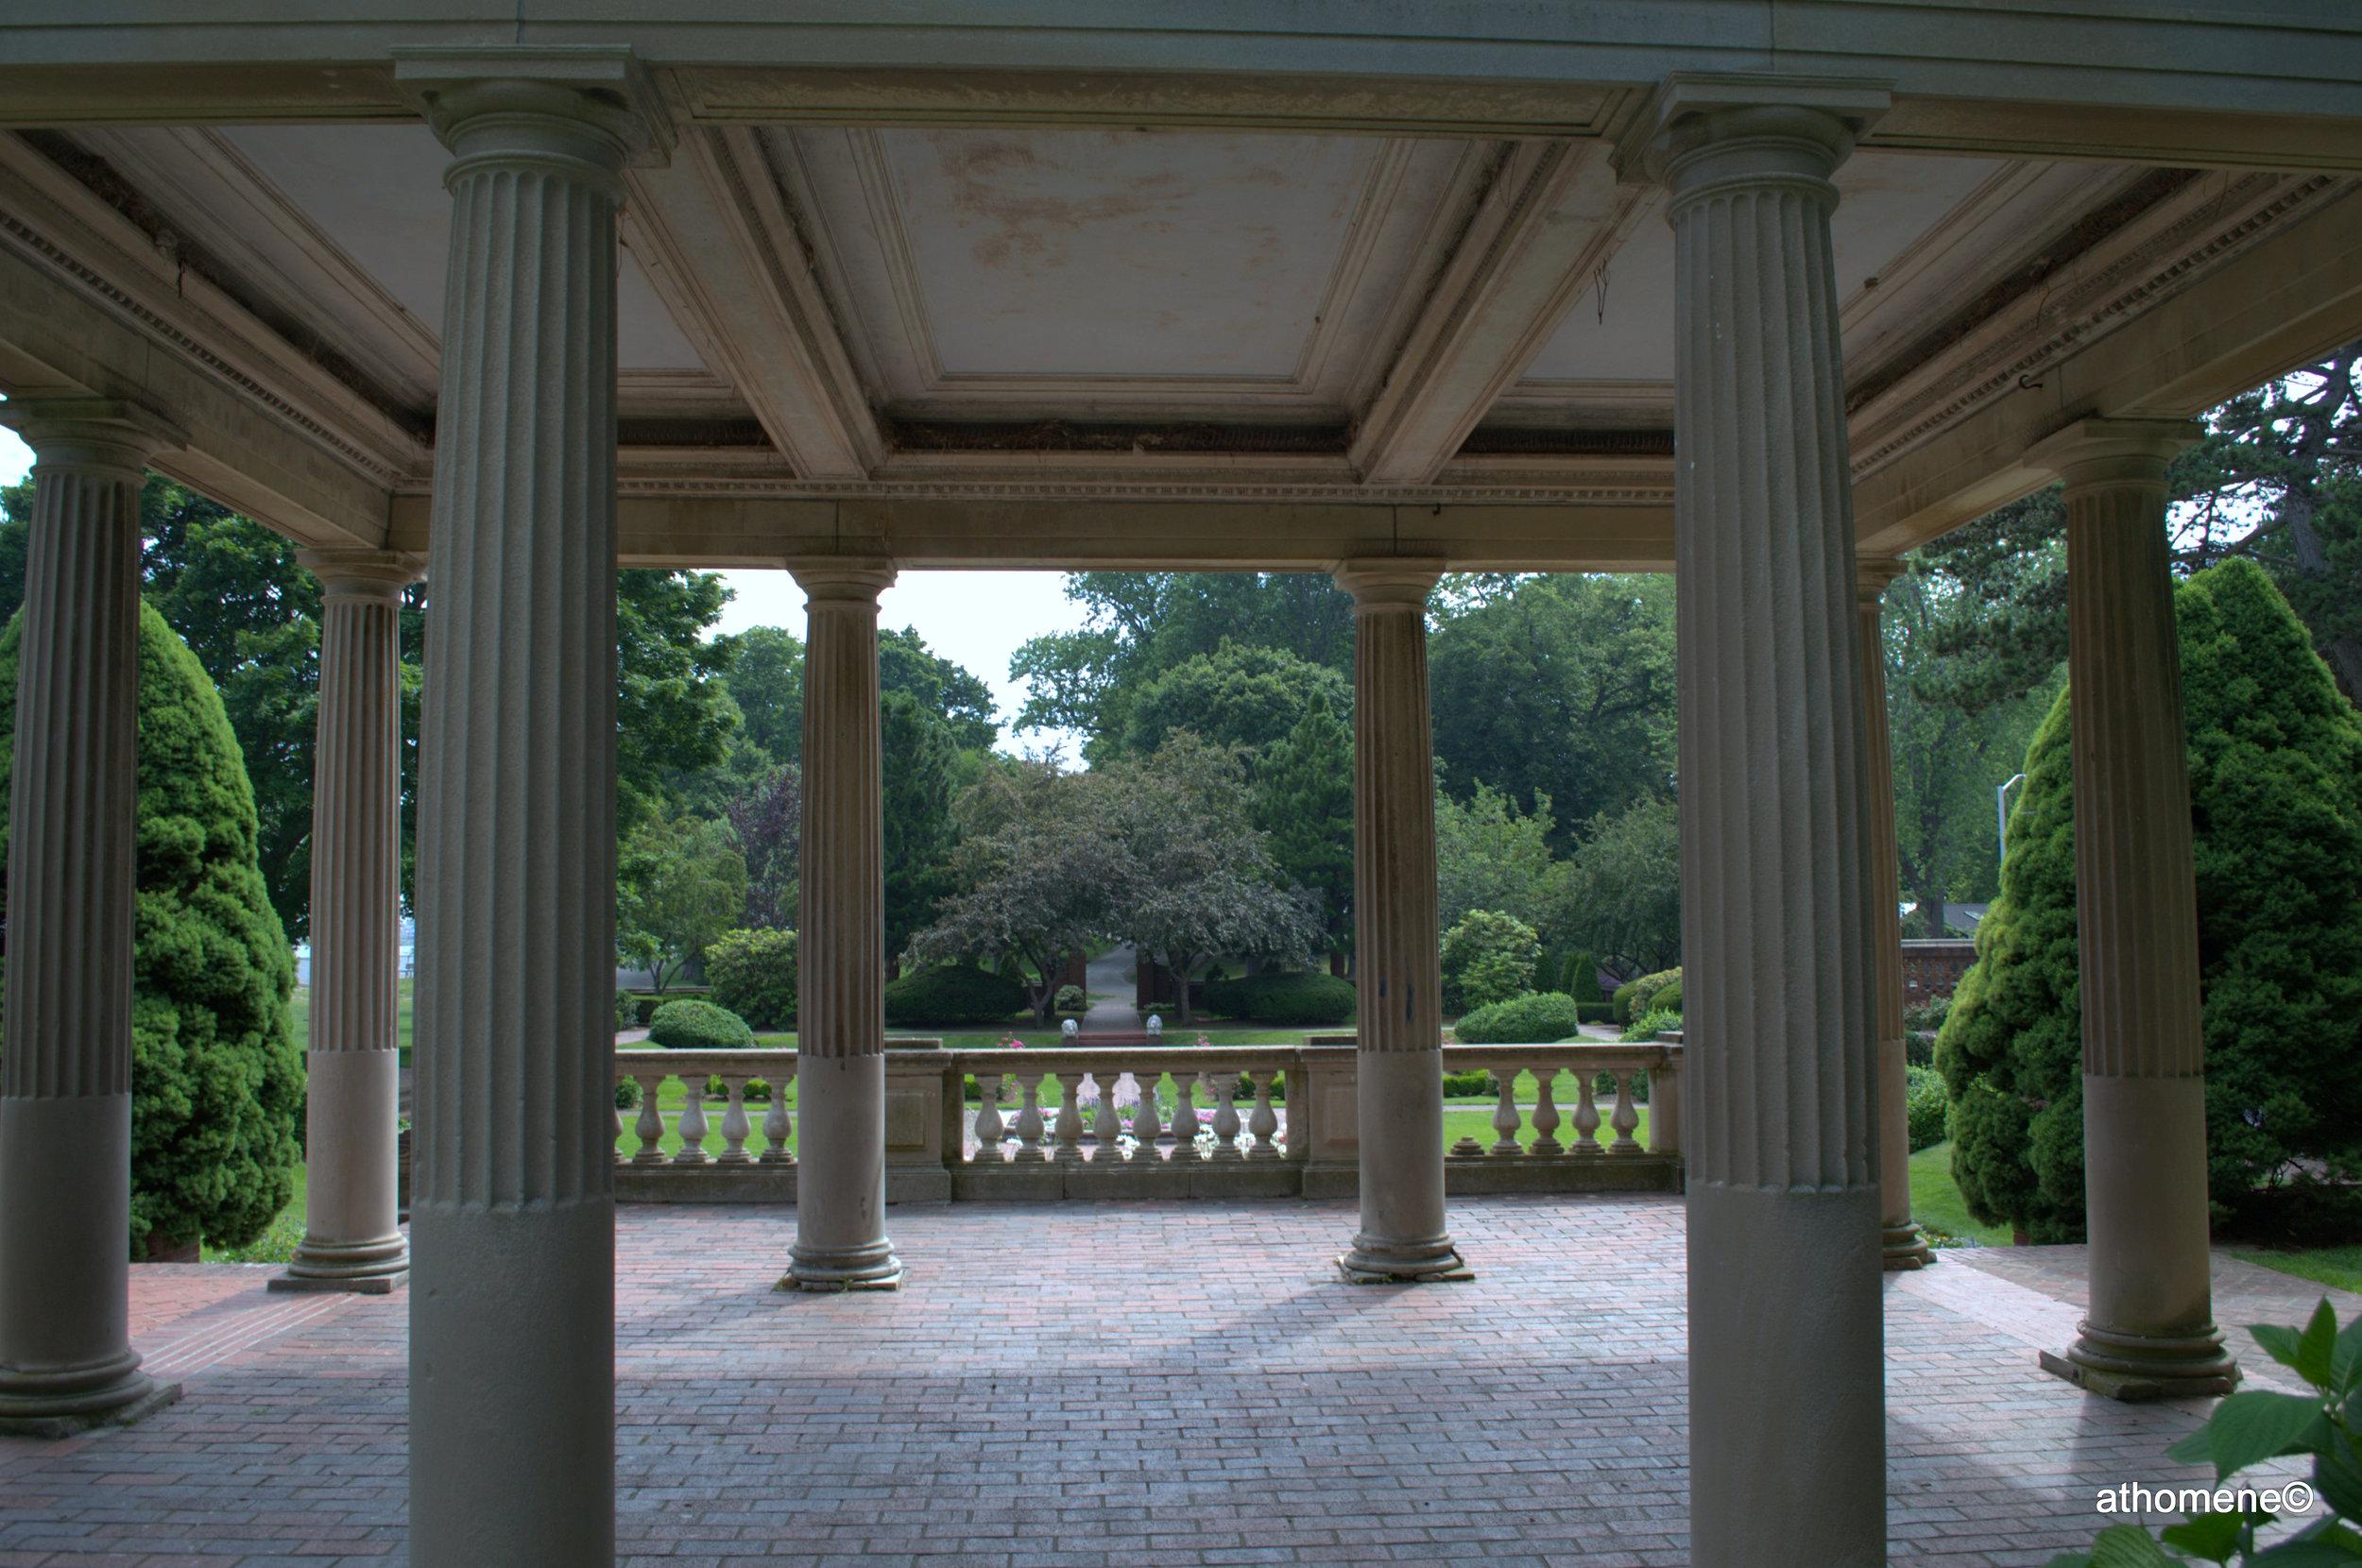 lynch park beverly rose garden